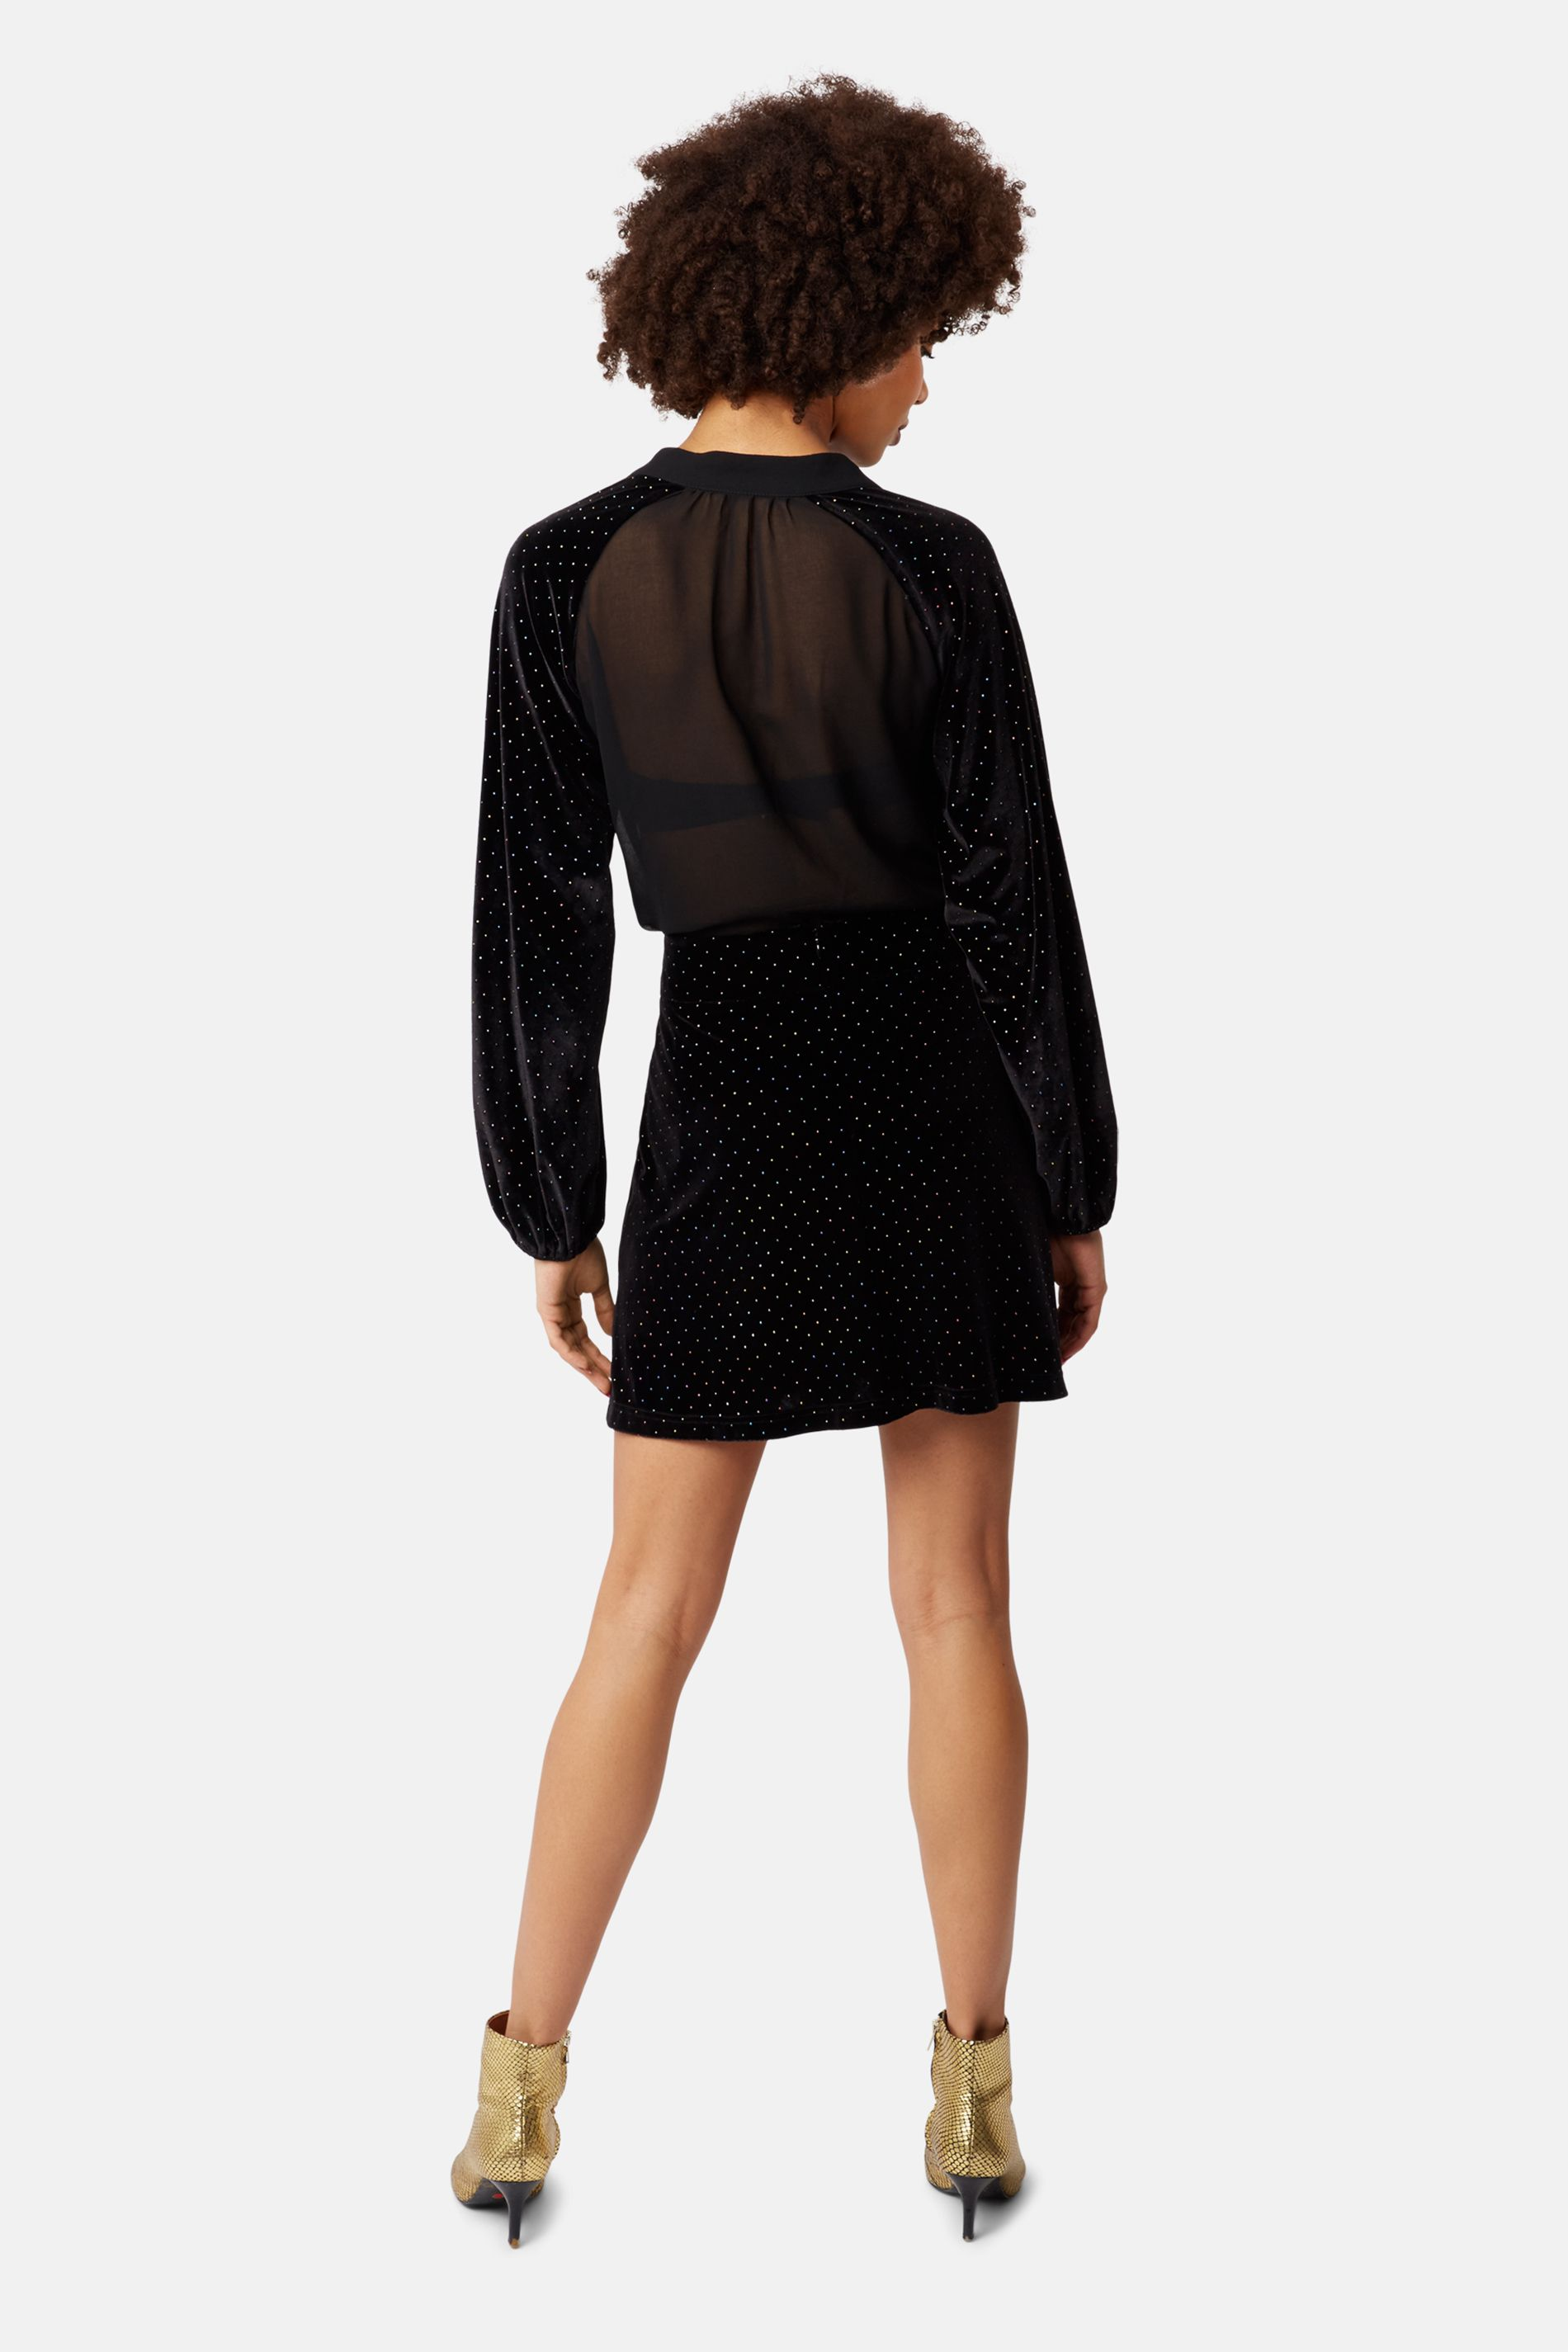 White Light Rainbow Stud Mini Skirt in Black